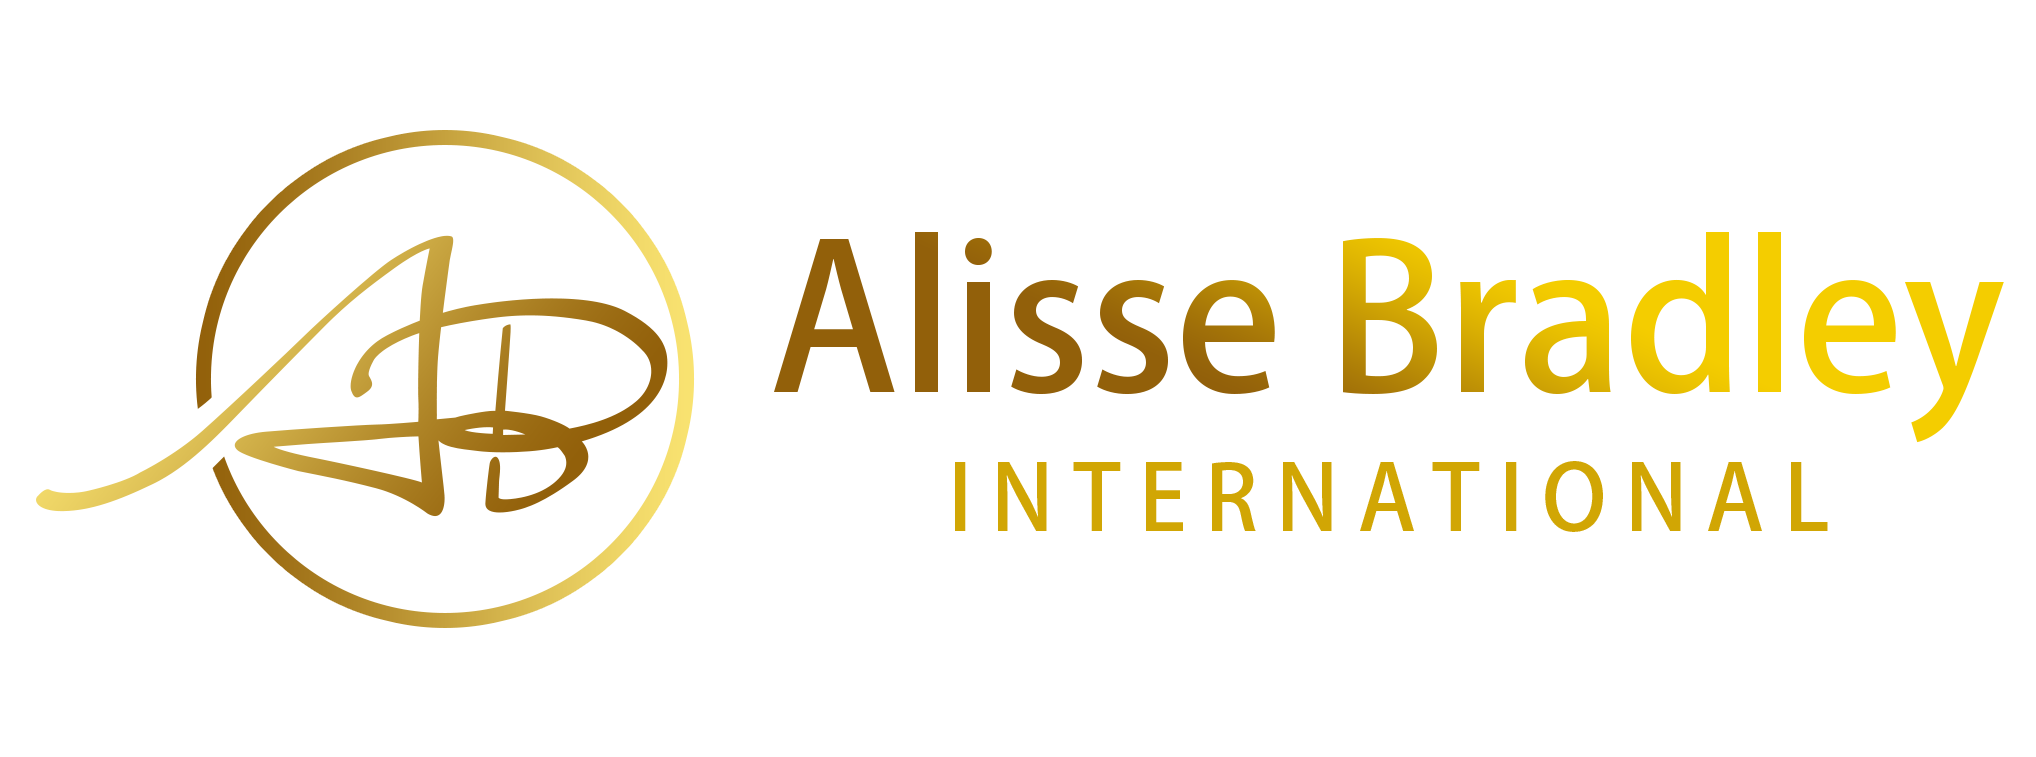 Alisse Bradley